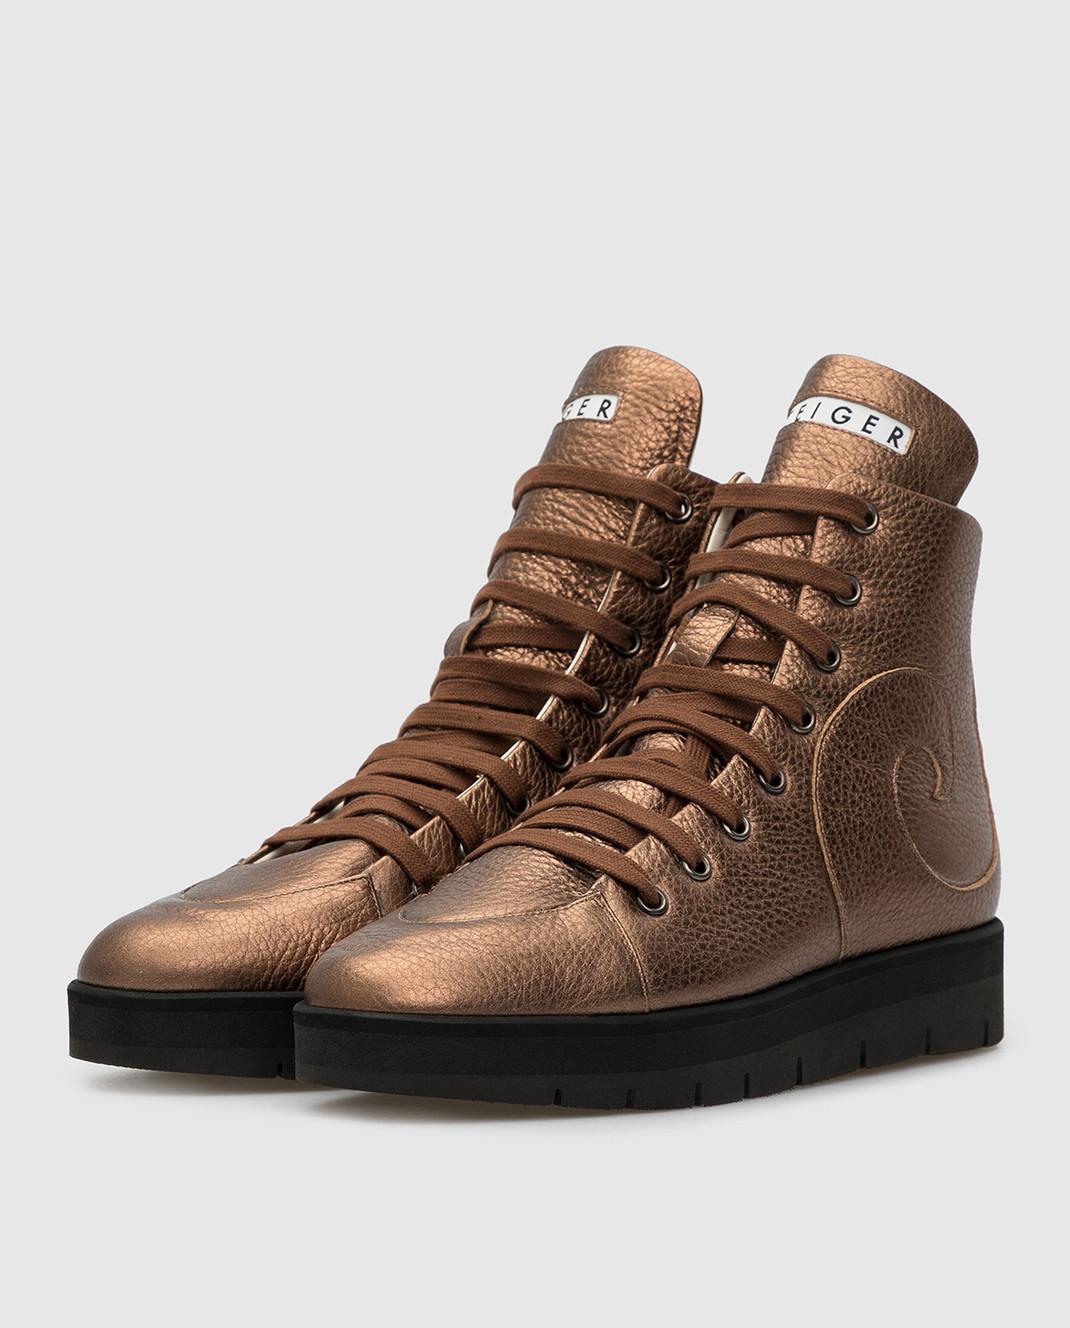 Steiger Бежевые ботинки 1384A изображение 3